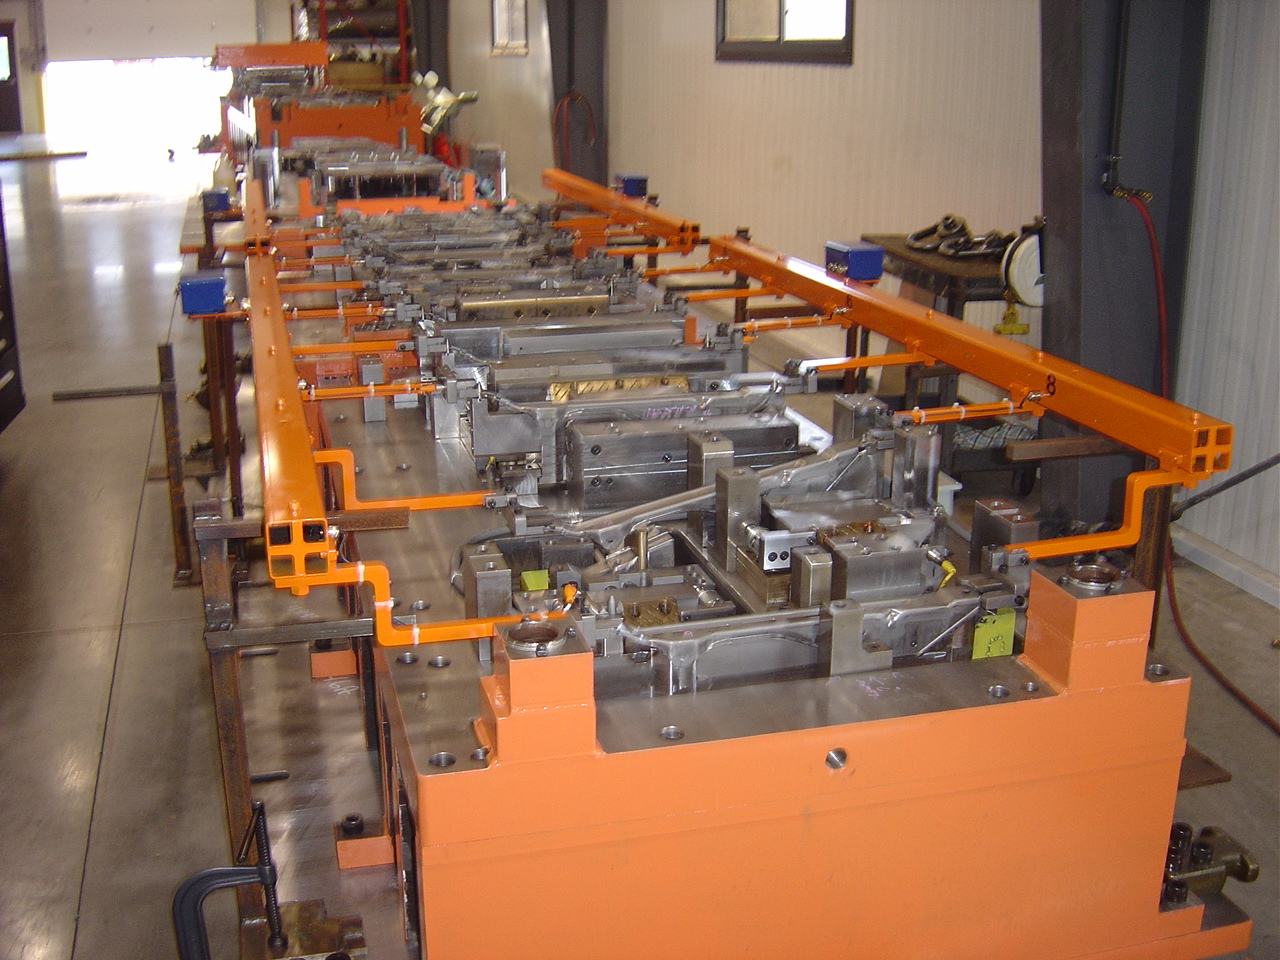 LMS Transfer Tool 3-20-07 001.jpg